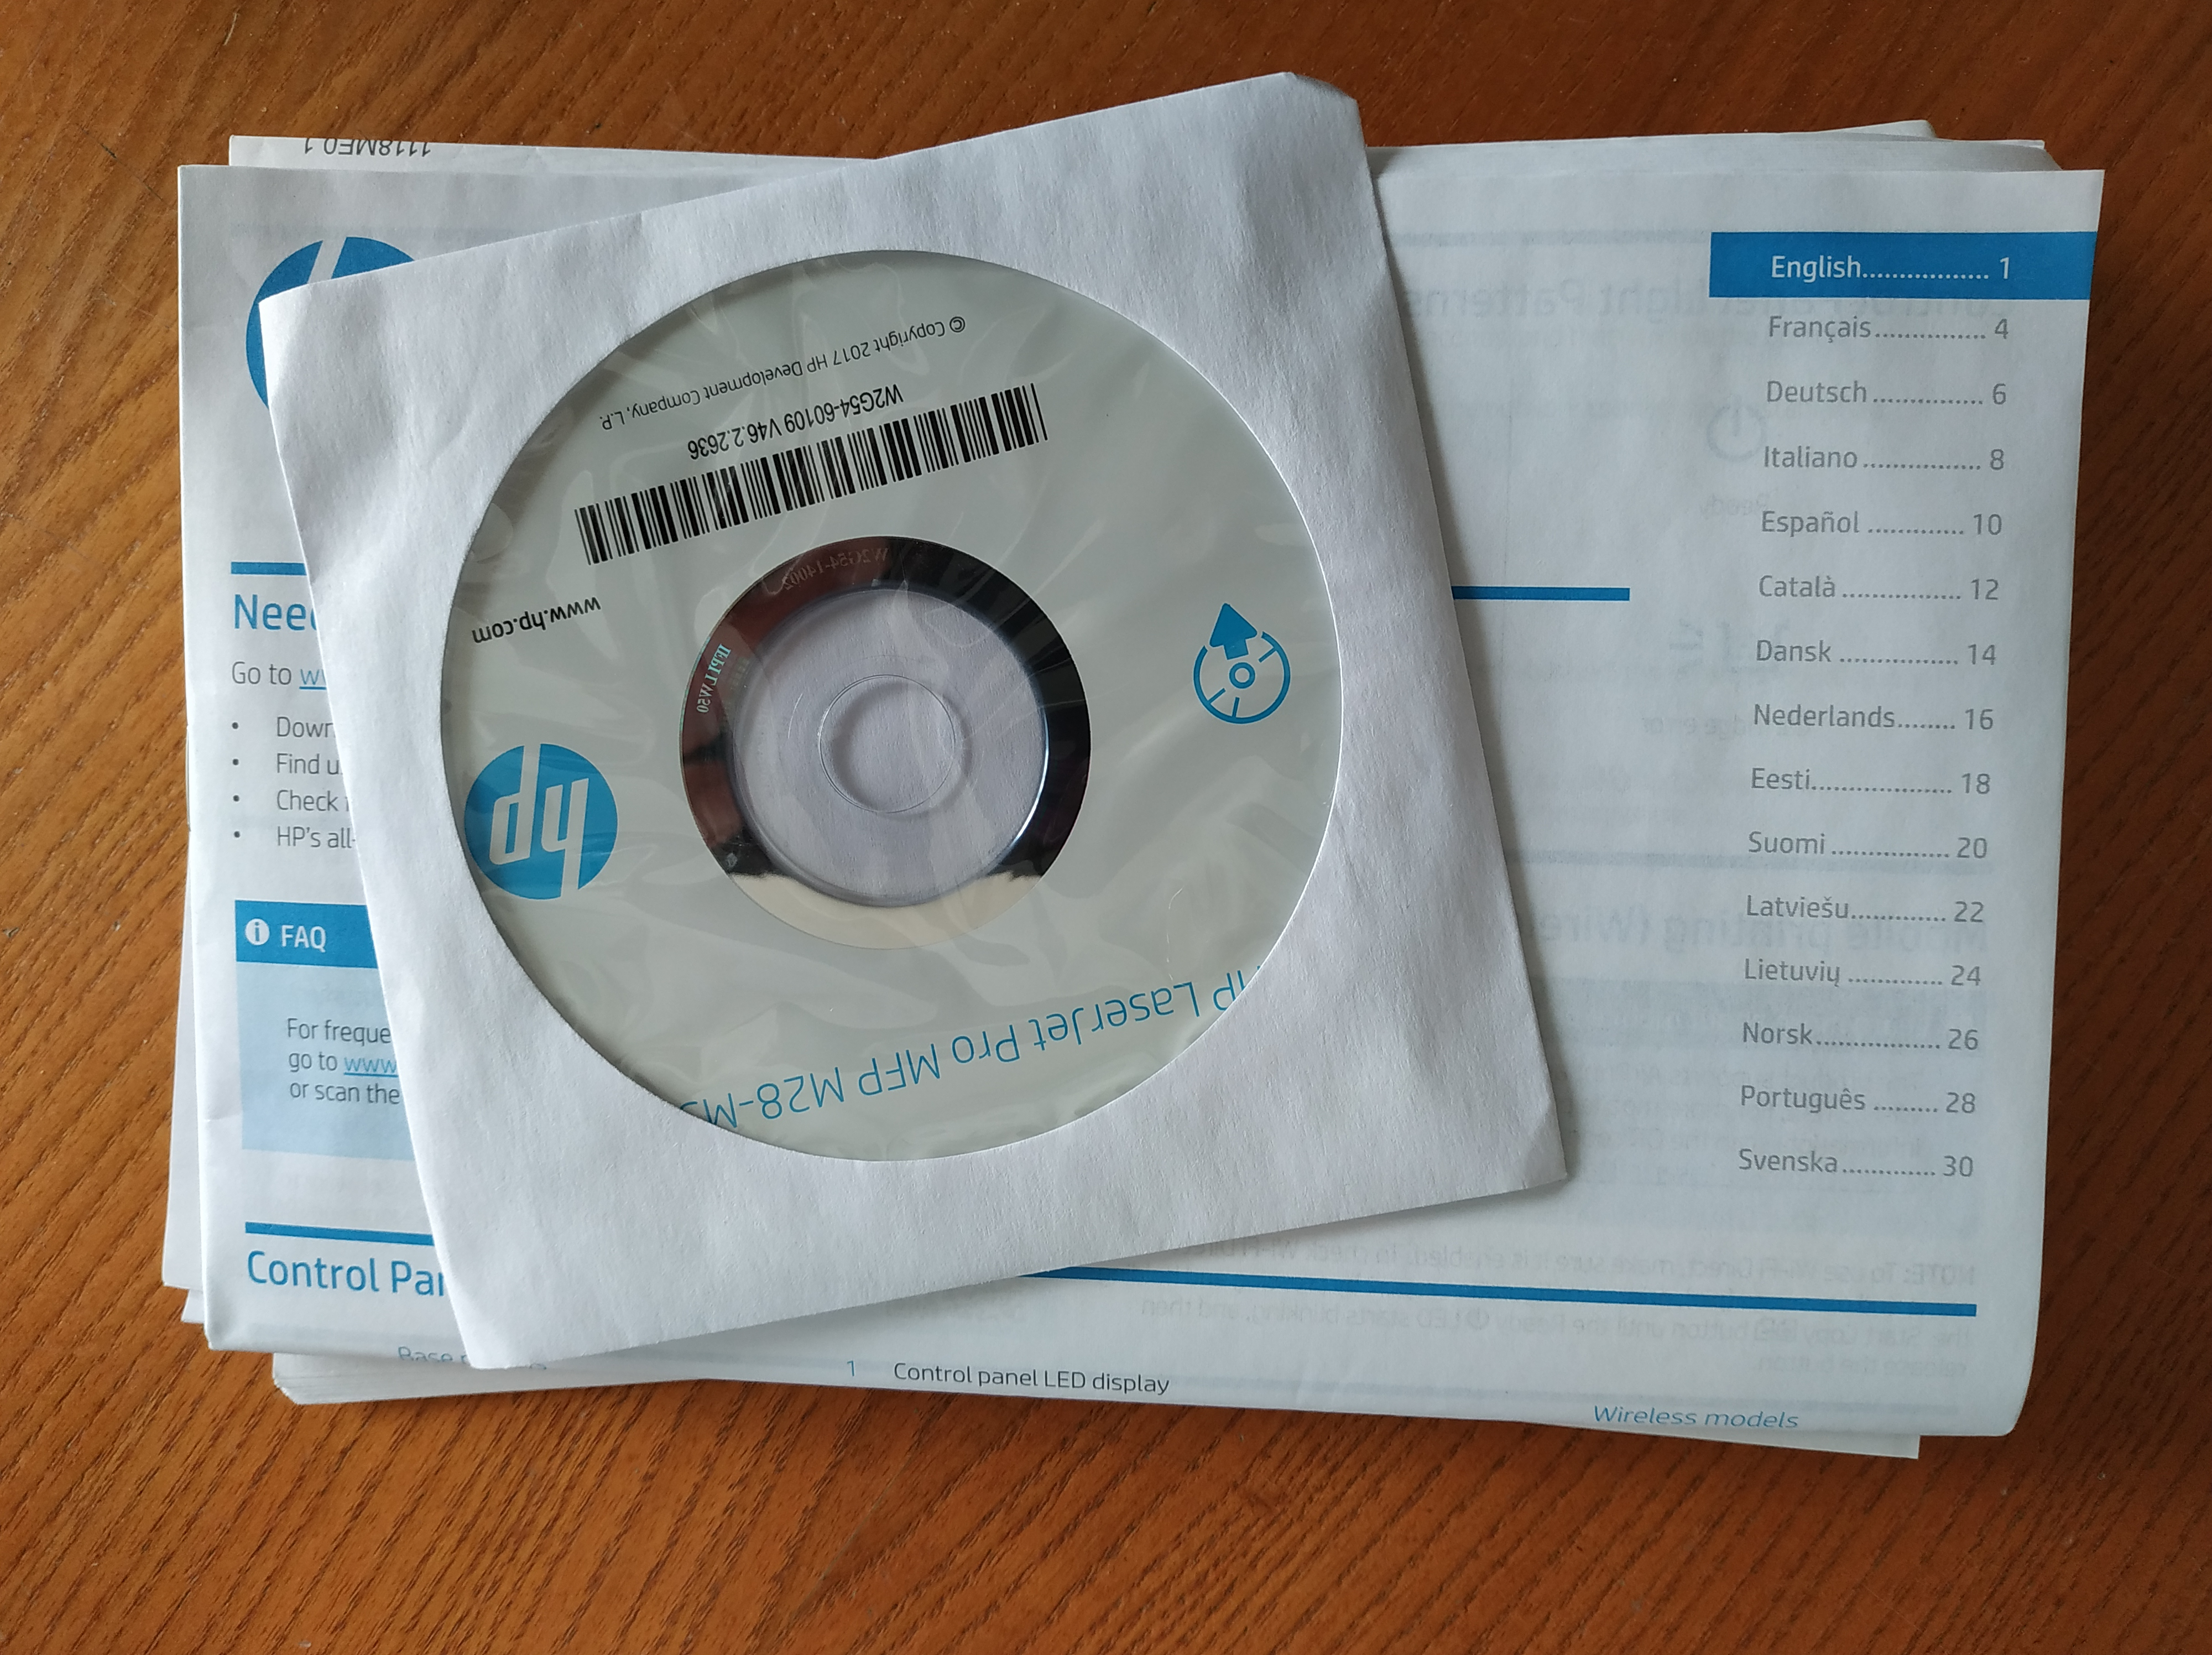 HP LaserJet Pro MFP M28a диск драйвер